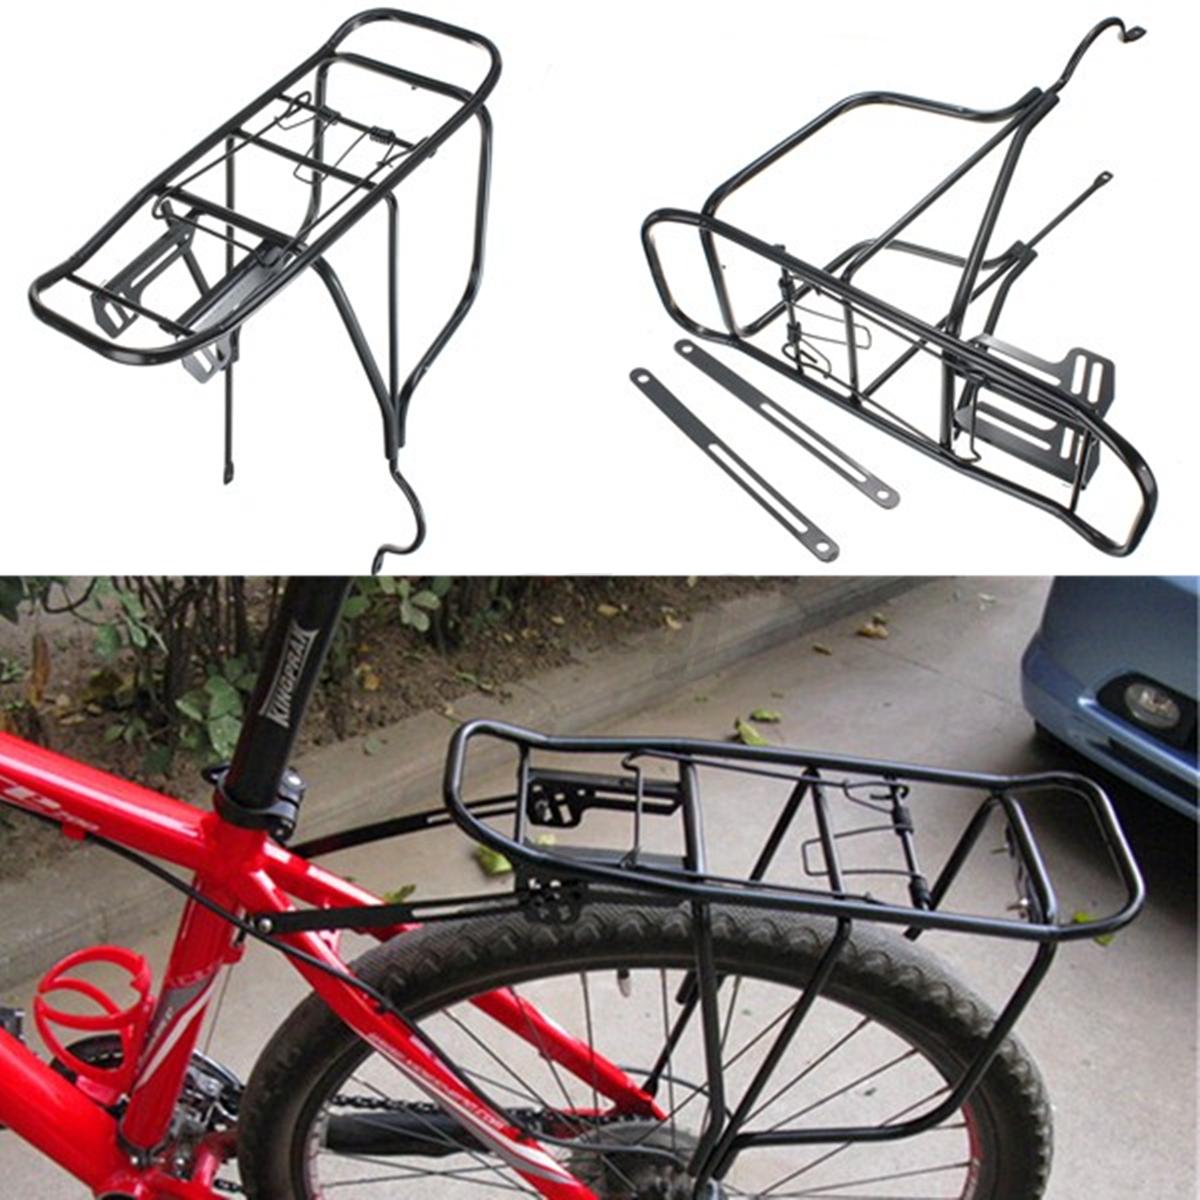 Mtb Bicycle Luggage Carrier Mountain Bike Rear Rack Seat